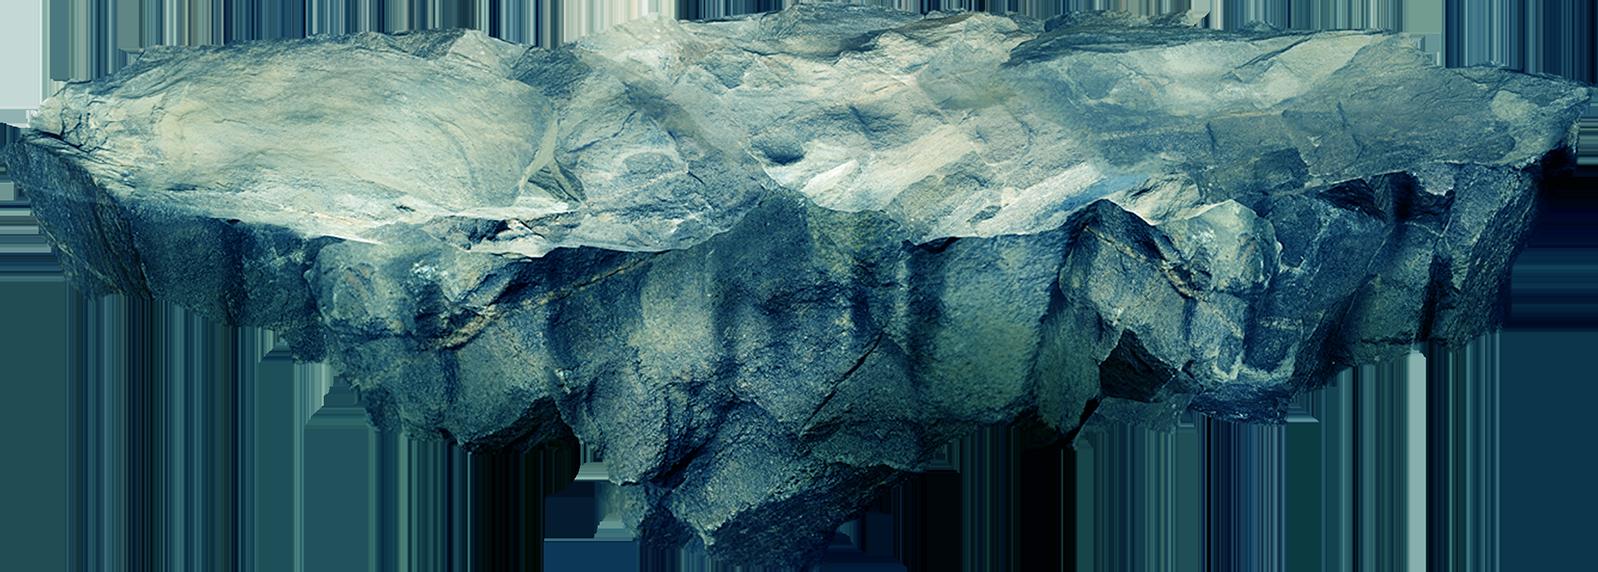 Glacier clipart mountain k2. Yahoo big idea chair